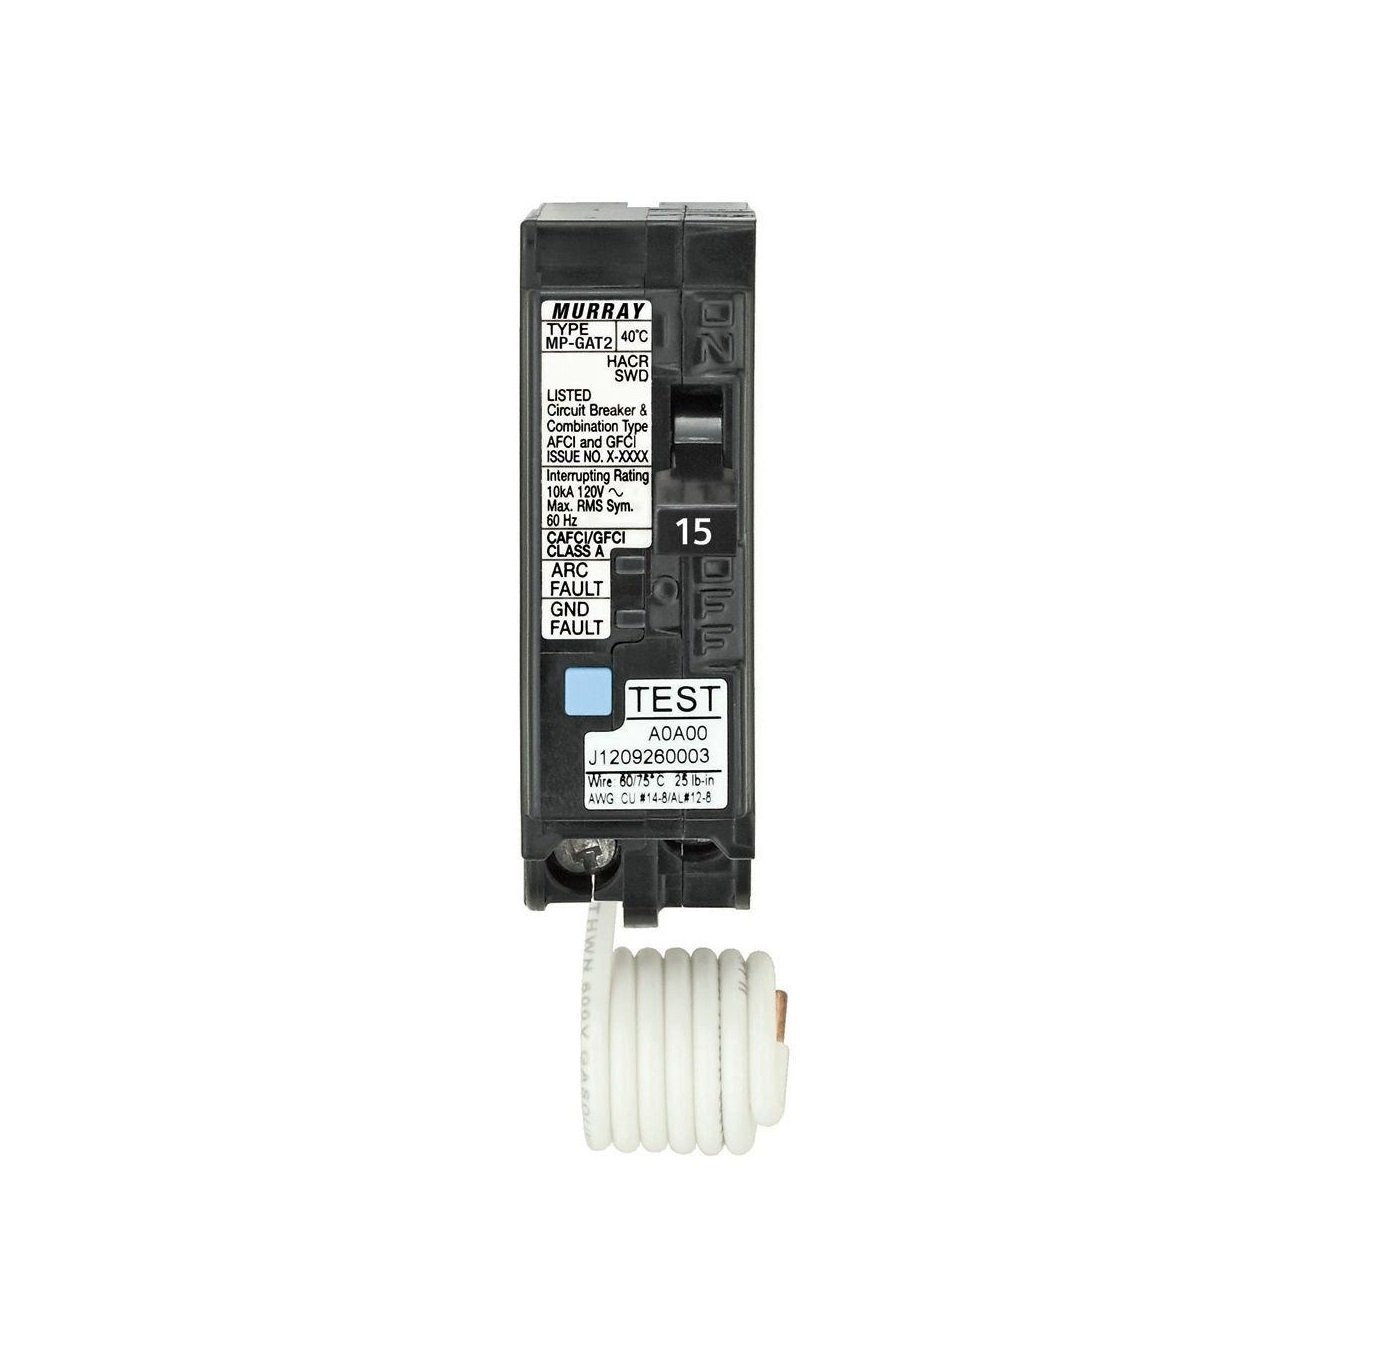 Murray MP115DFP 15 Amp AFCI/GFCI Dual Function Circuit Breaker